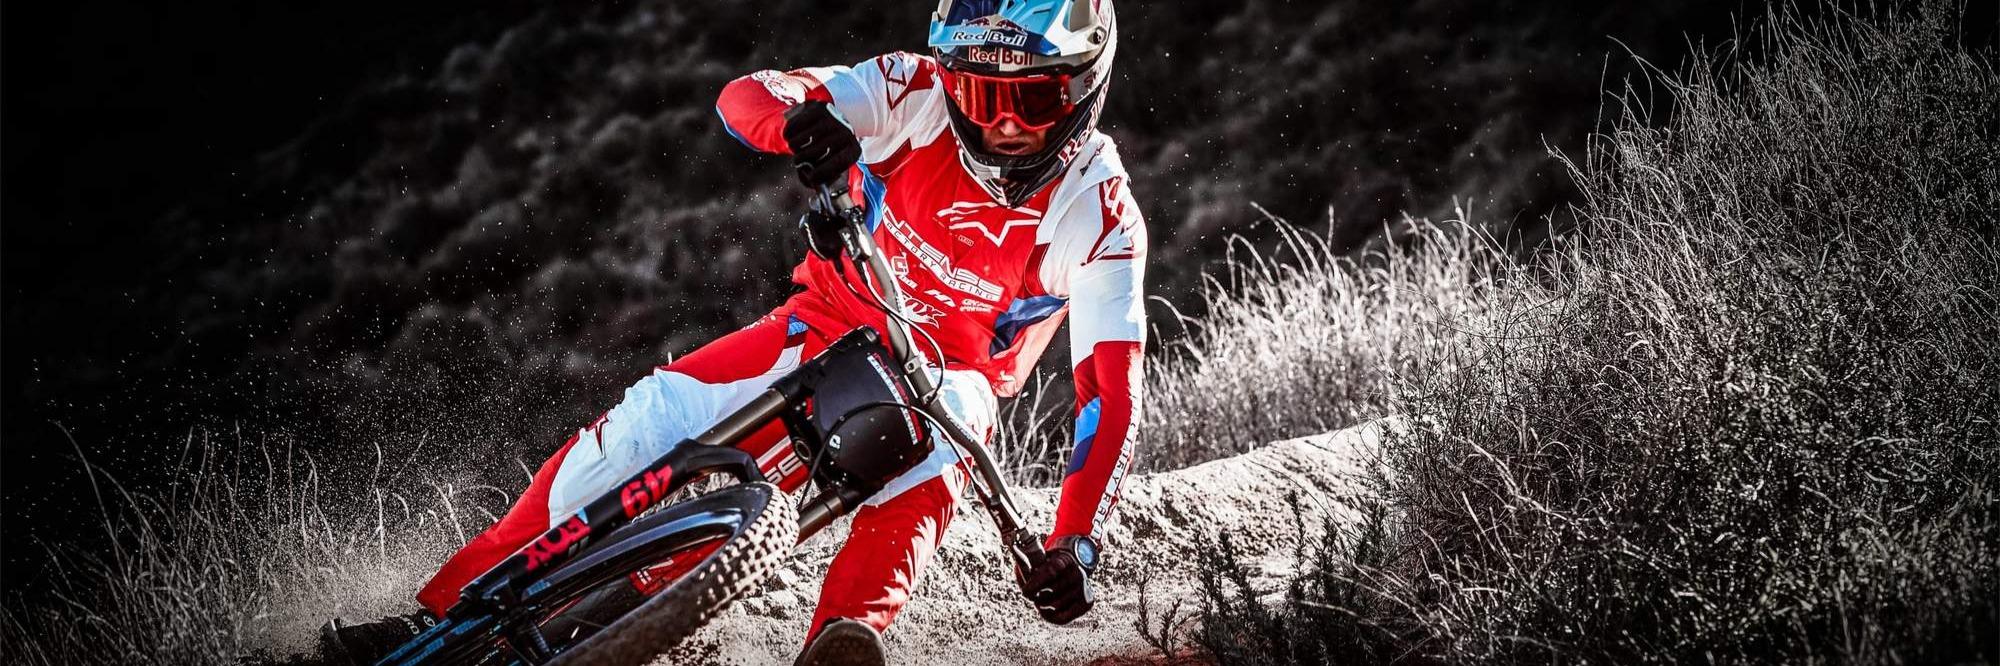 Mountain biker downhilling on an Intense mountain bike.